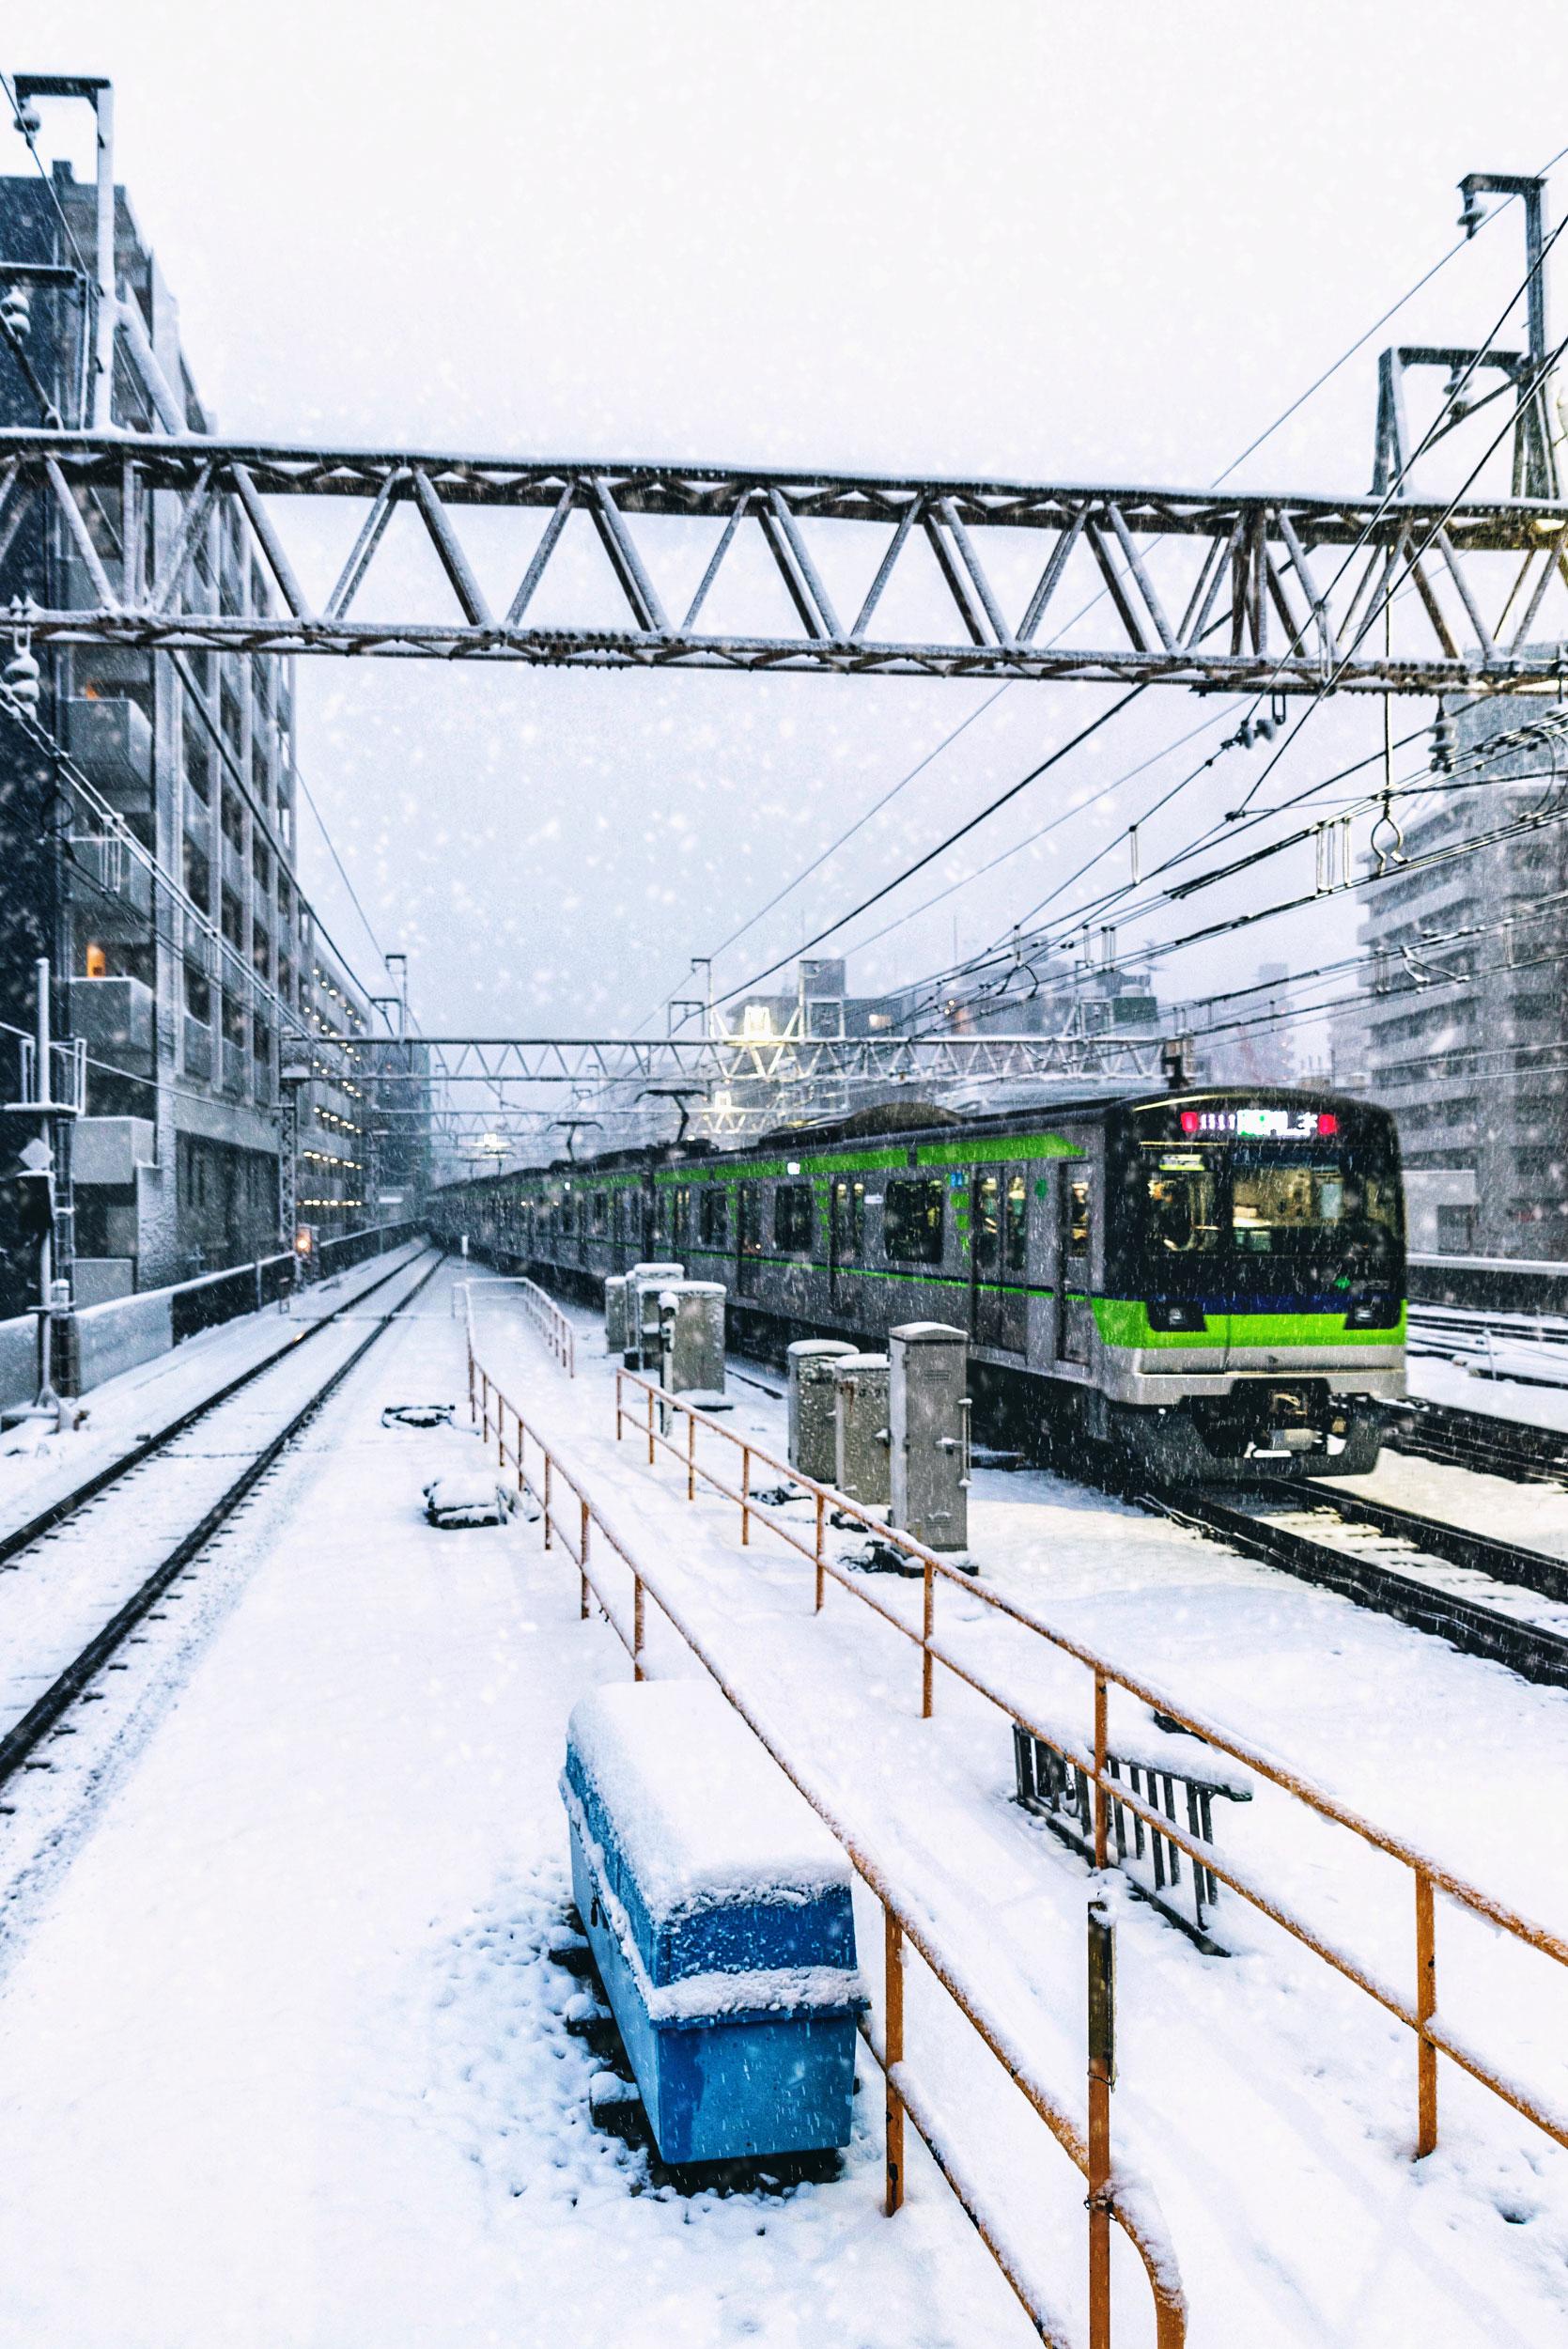 A Keio line train departs Sasazuka station bound for Hashimoto.